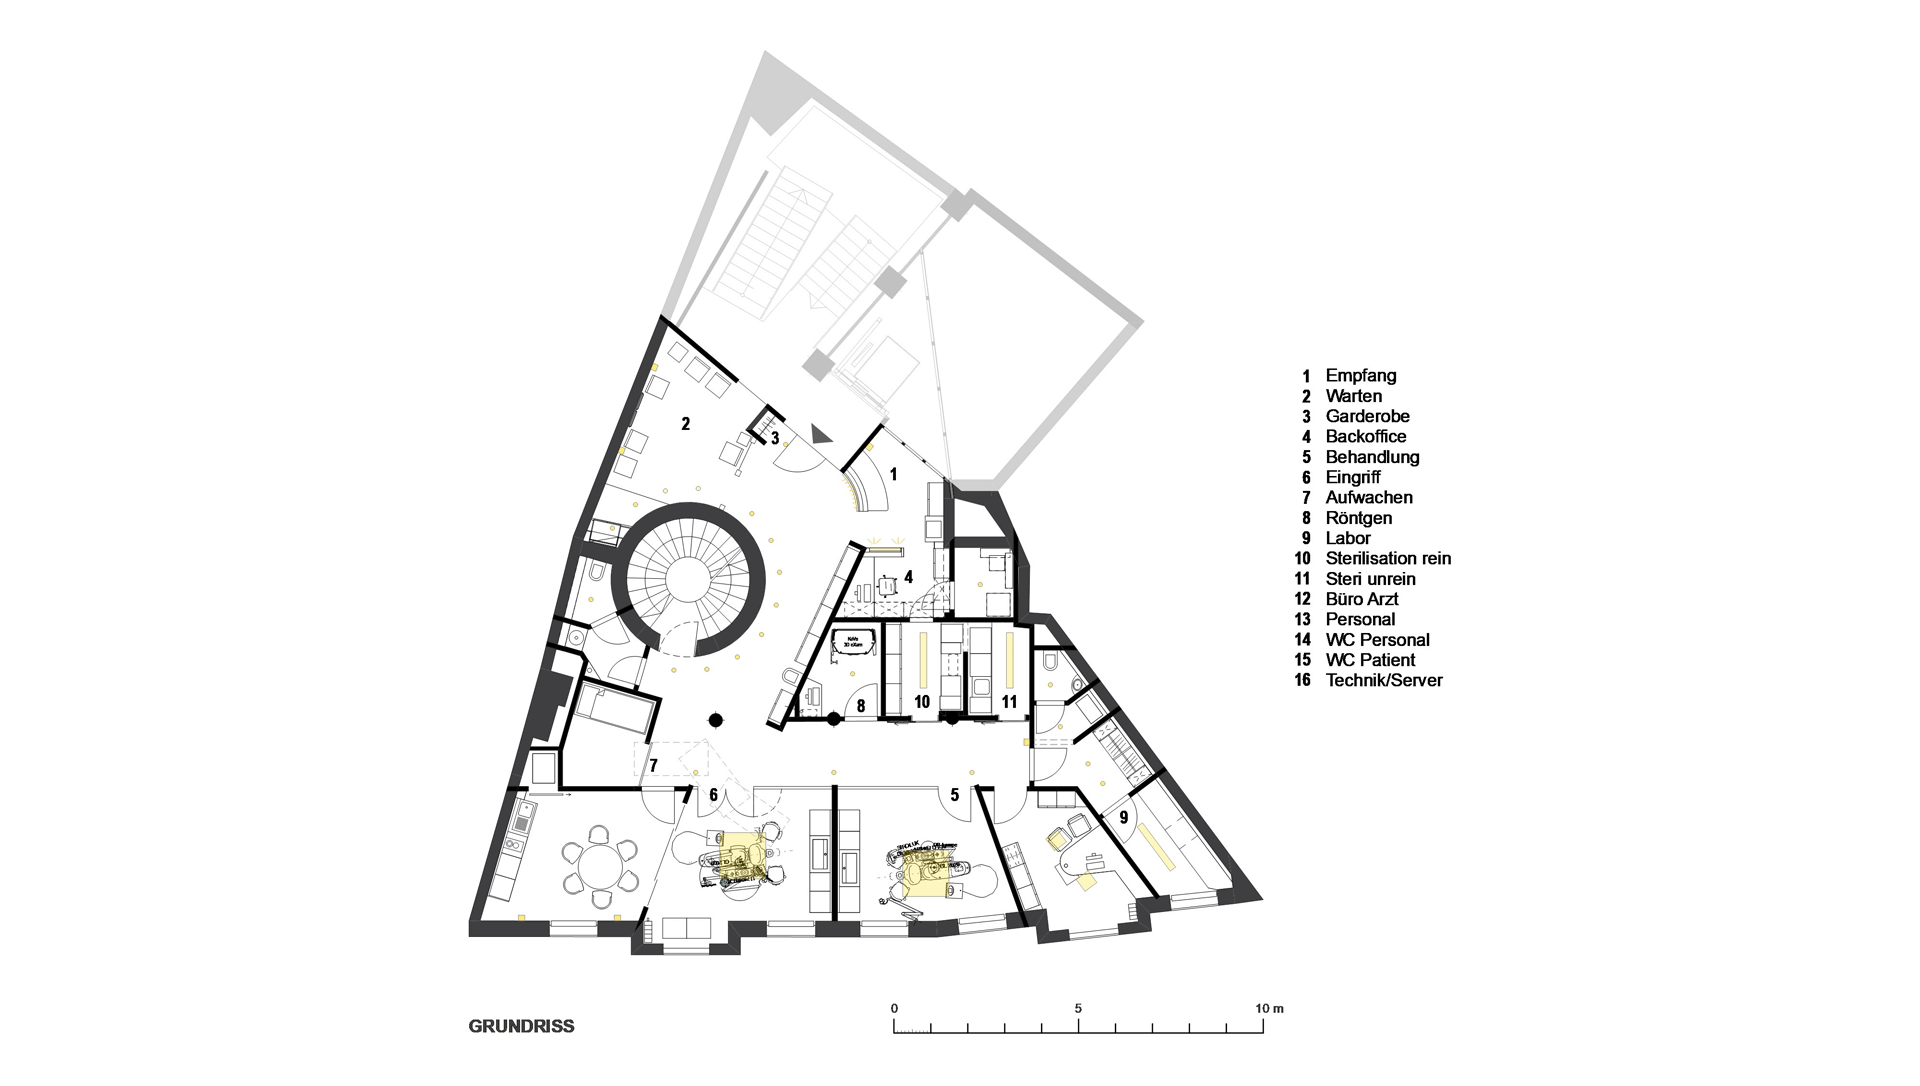 Endodontologie Praxis in Augsburg / Grundriss